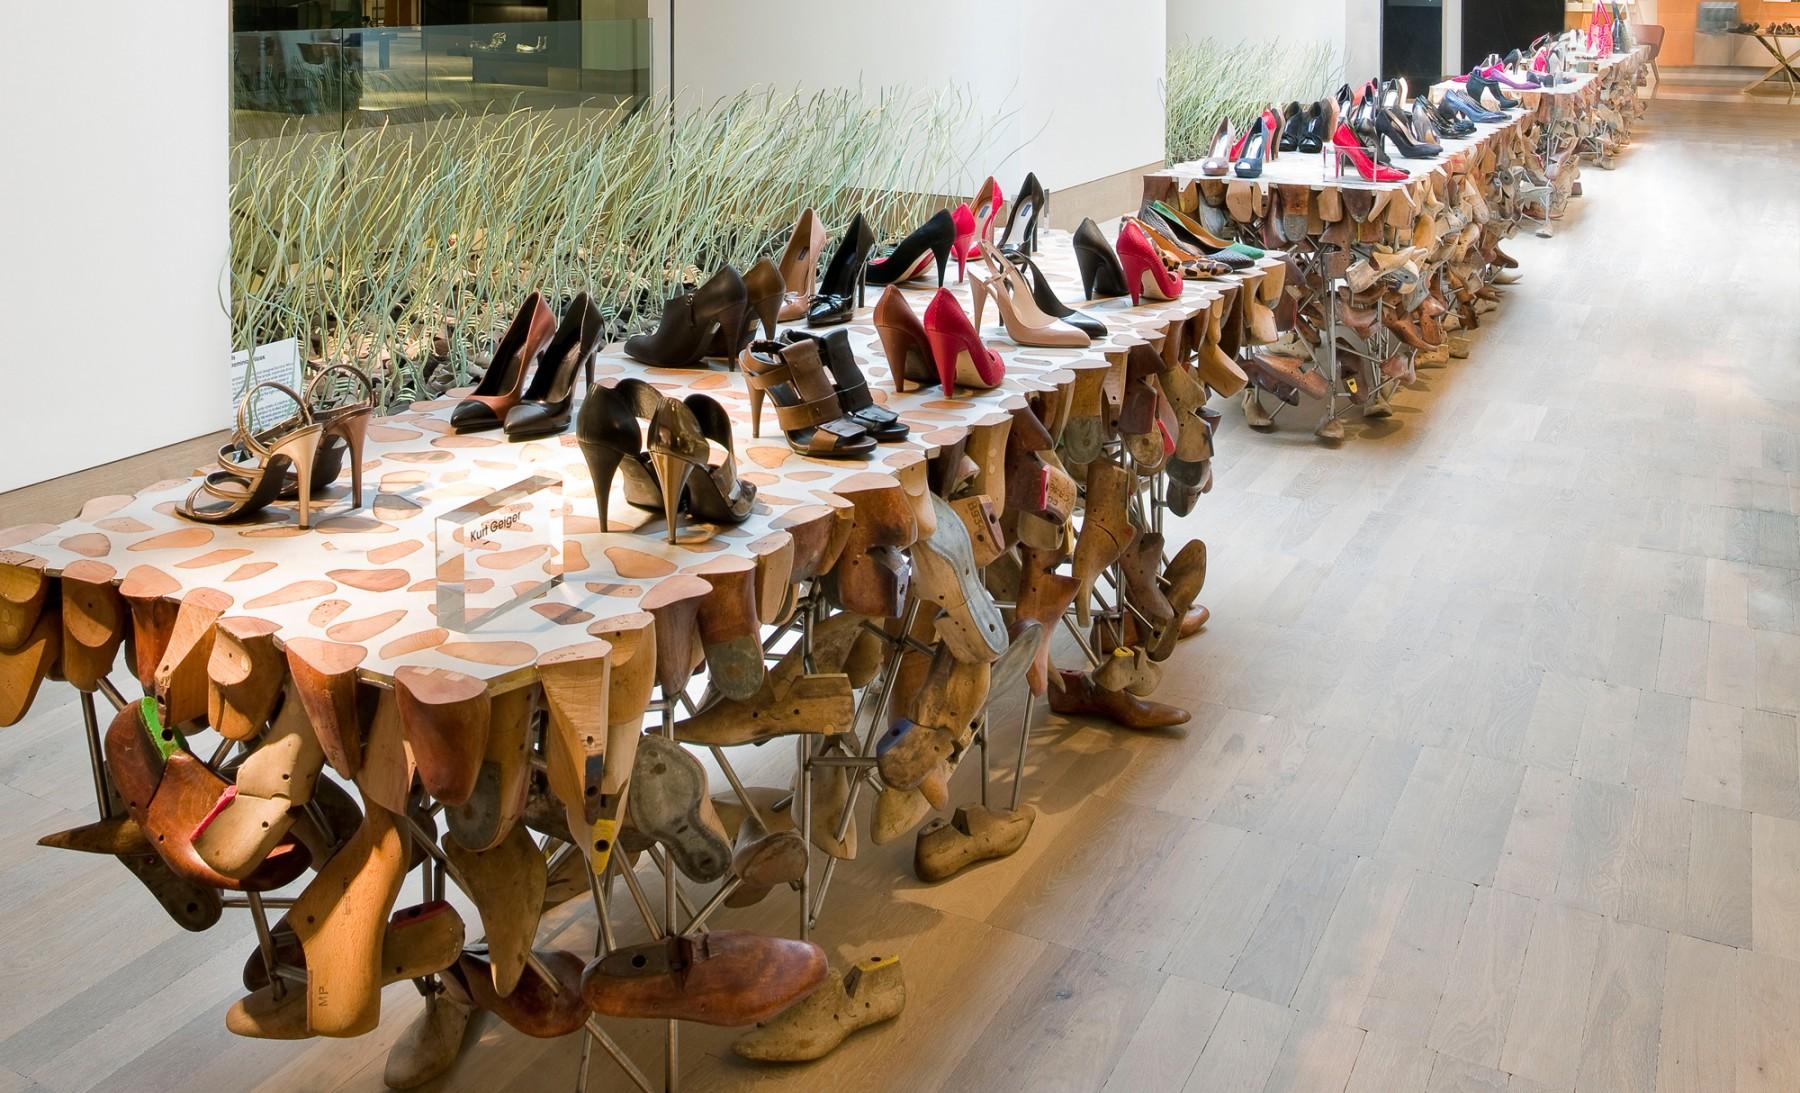 Selfridges-London-designer-fashion-retail-Jamie-Fobert-Architects-shop-shoe-last-table-galleries-2-2